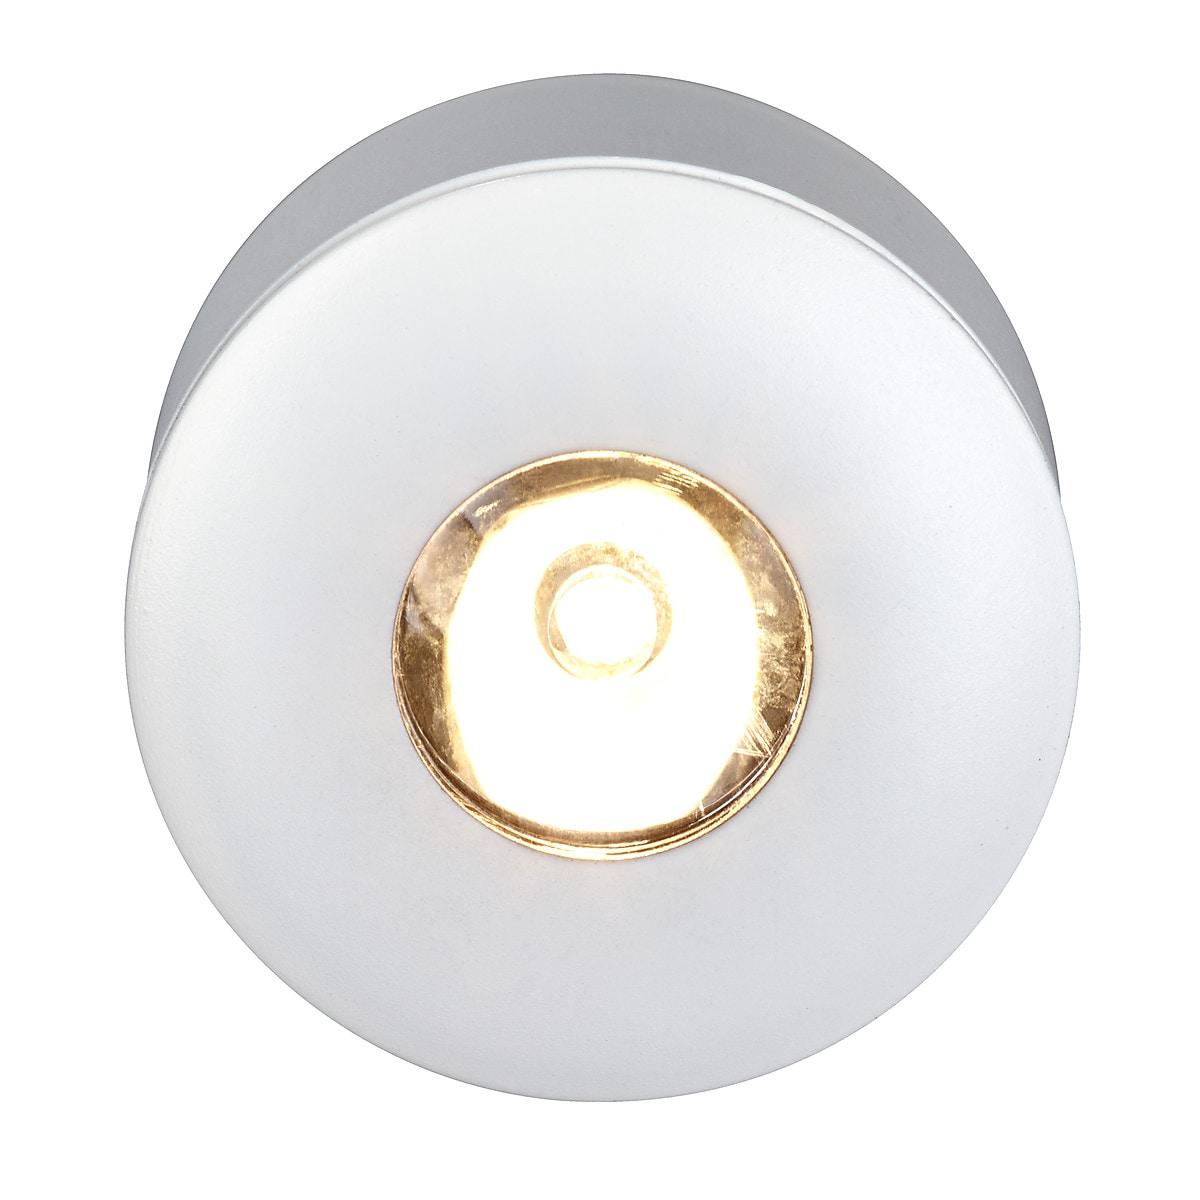 Downlight mini LED 1-pack Northlight